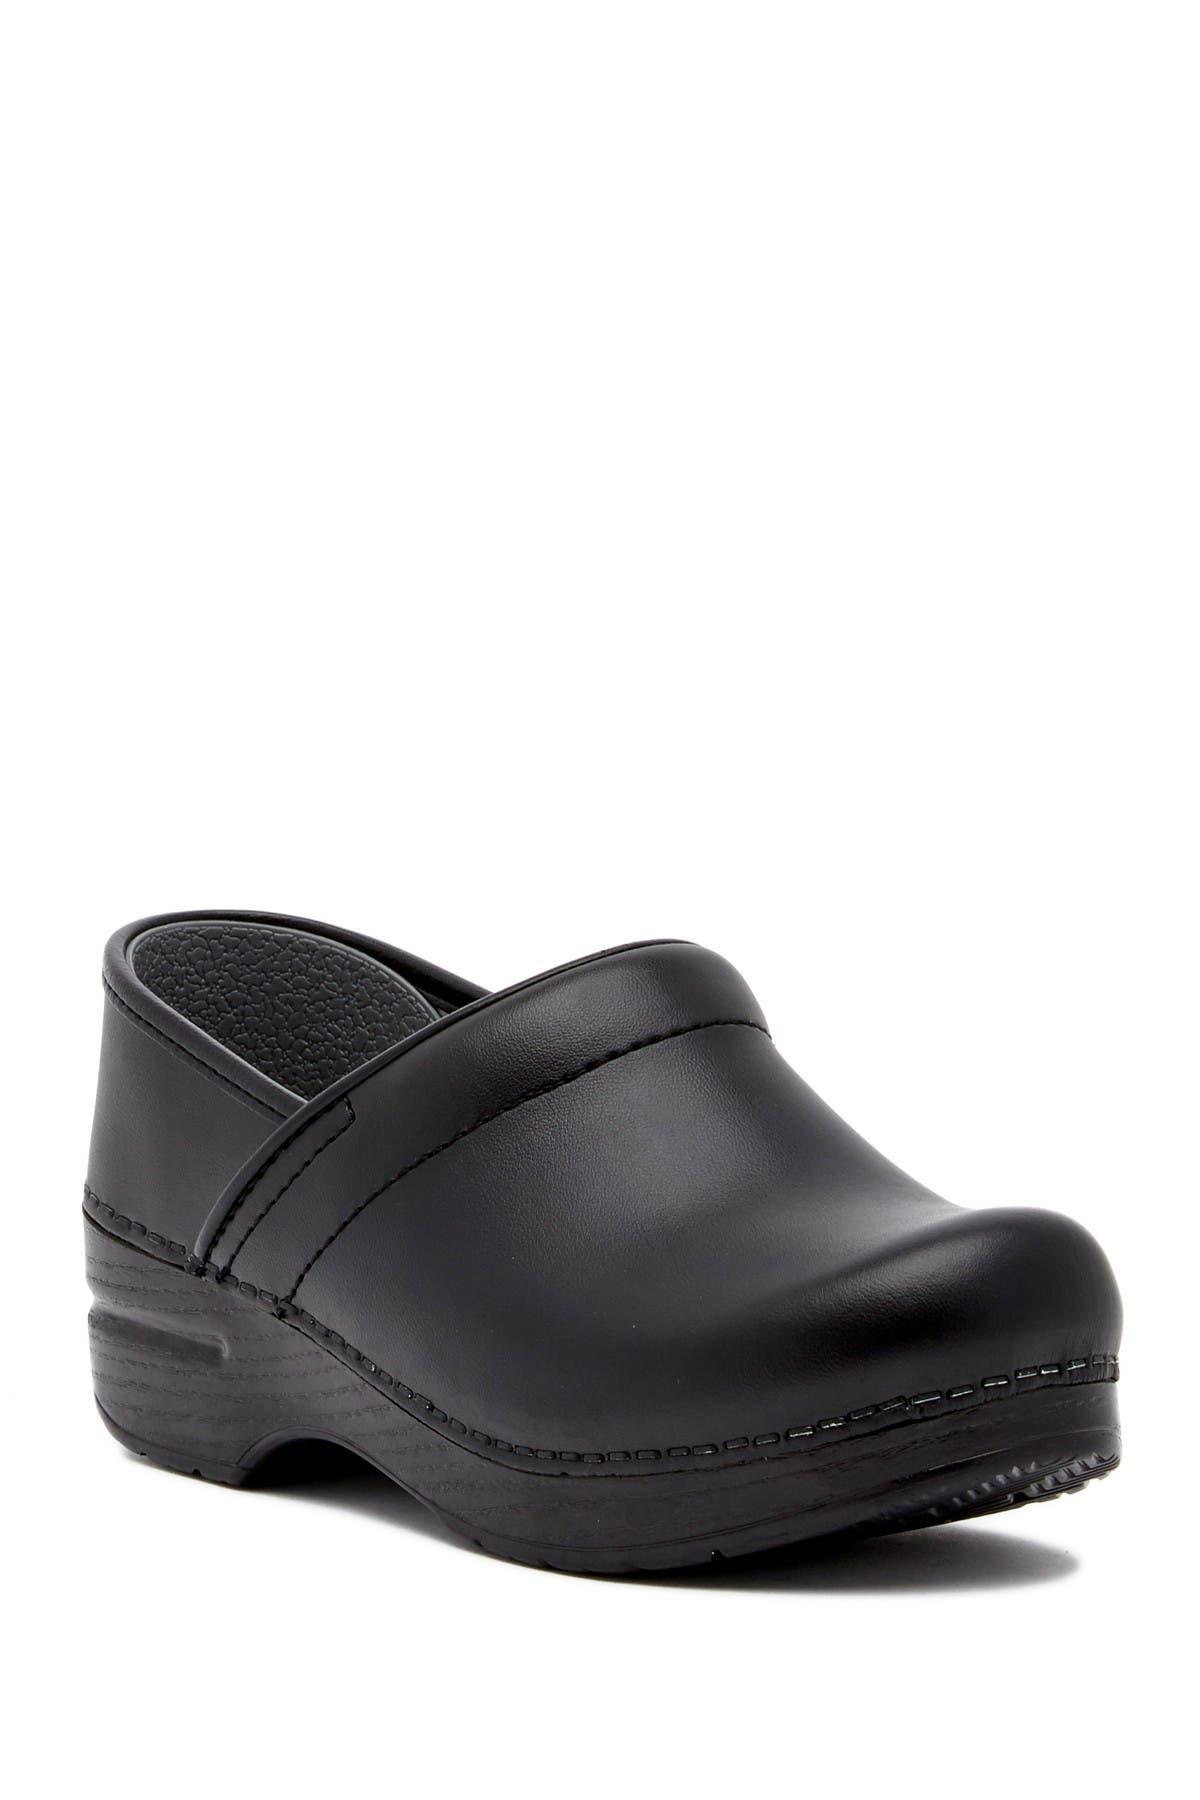 Dansko | Professional Leather Clog